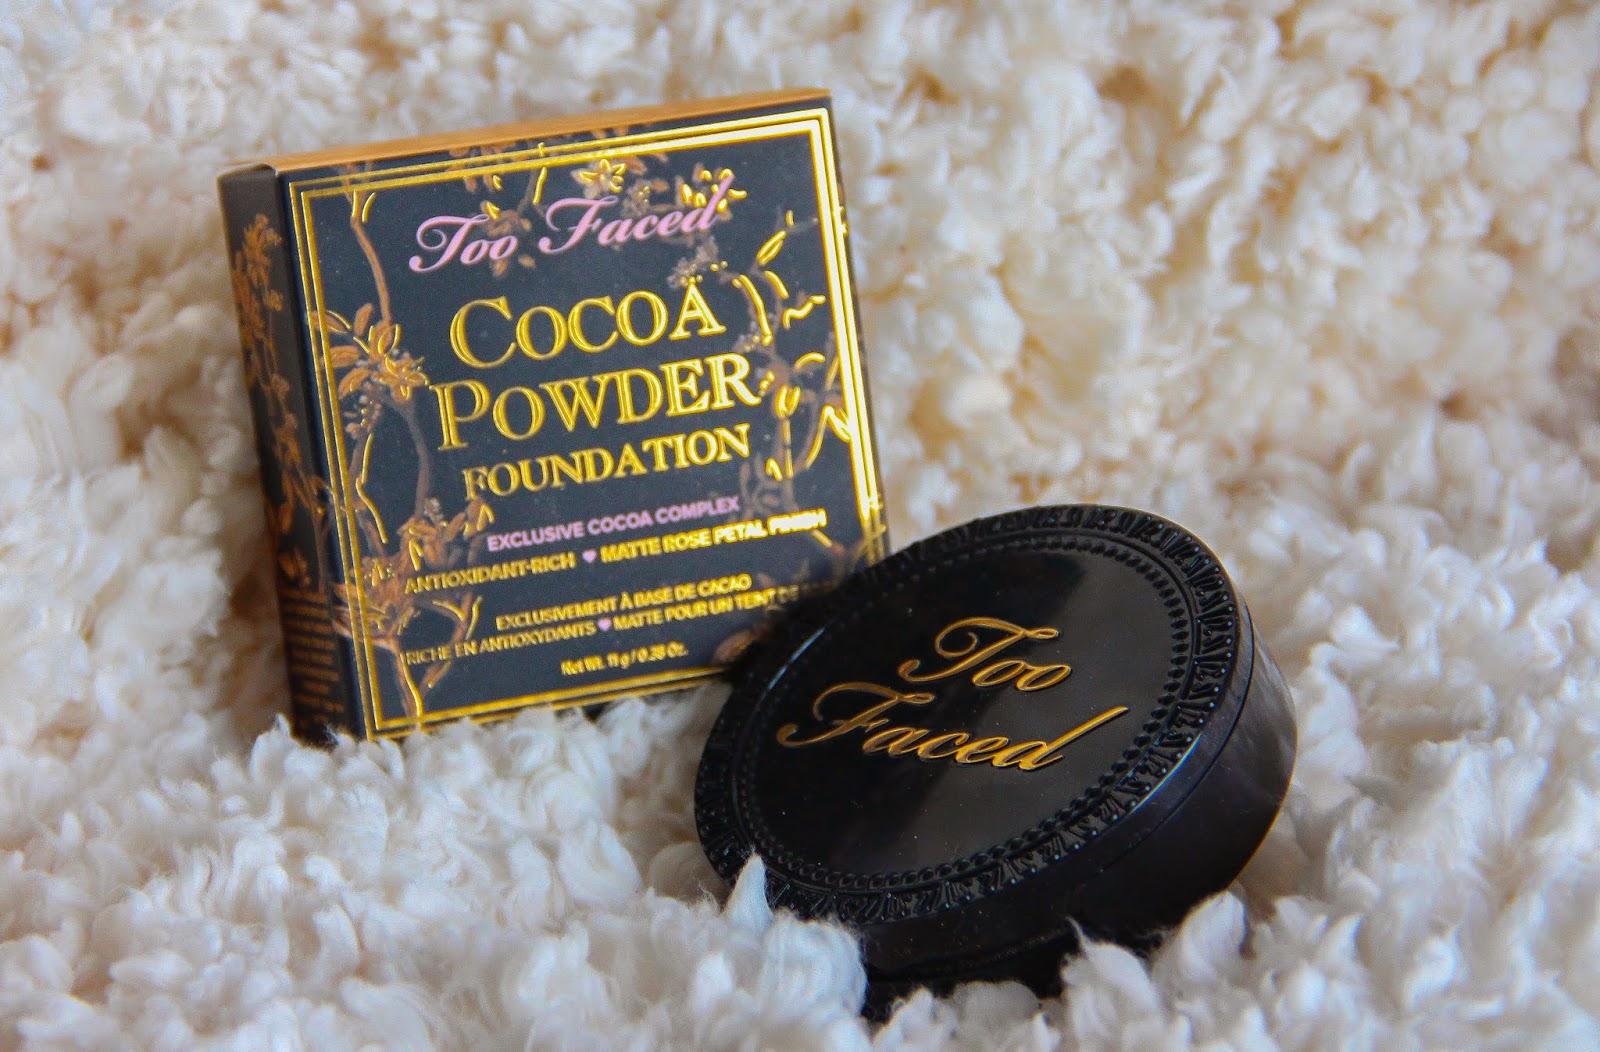 Fond de teint, poudre powder